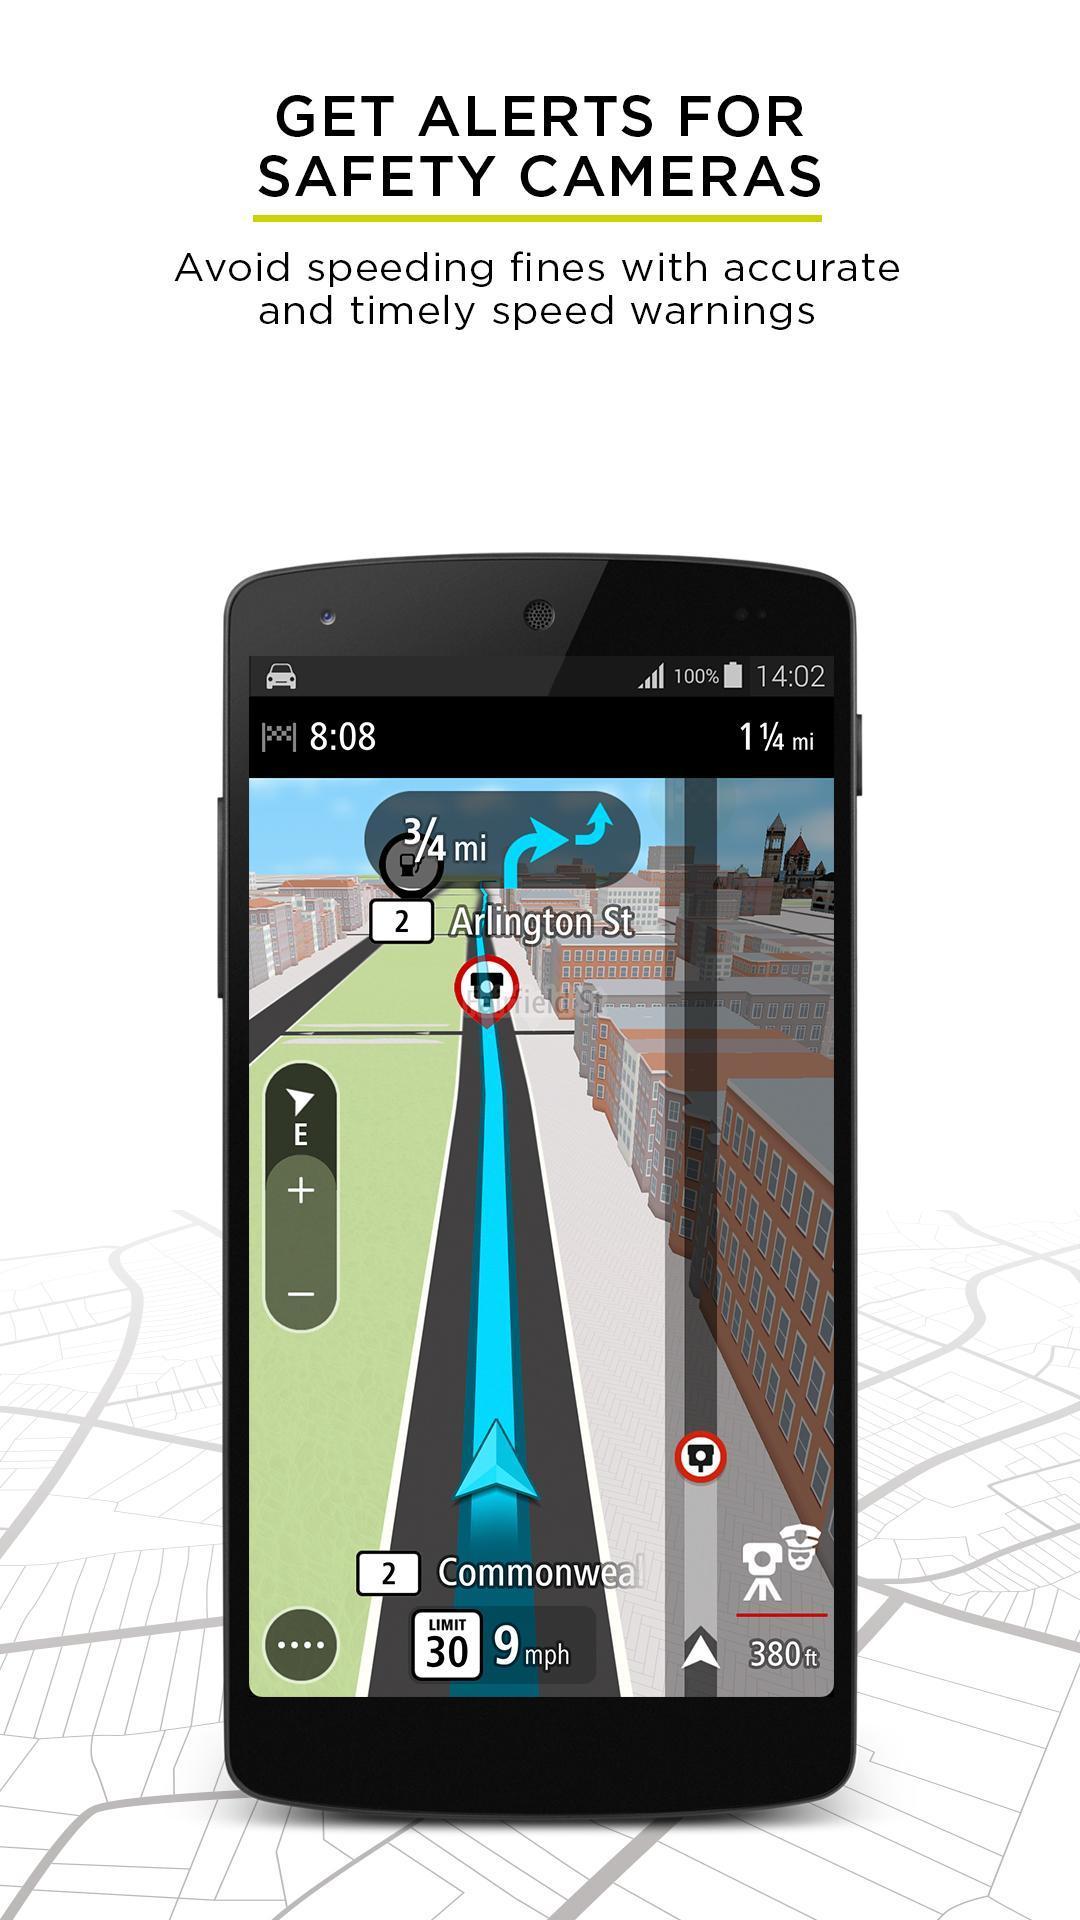 TomTom GPS Navigation - Live Traffic Alerts & Maps 2.0.4 Screenshot 5